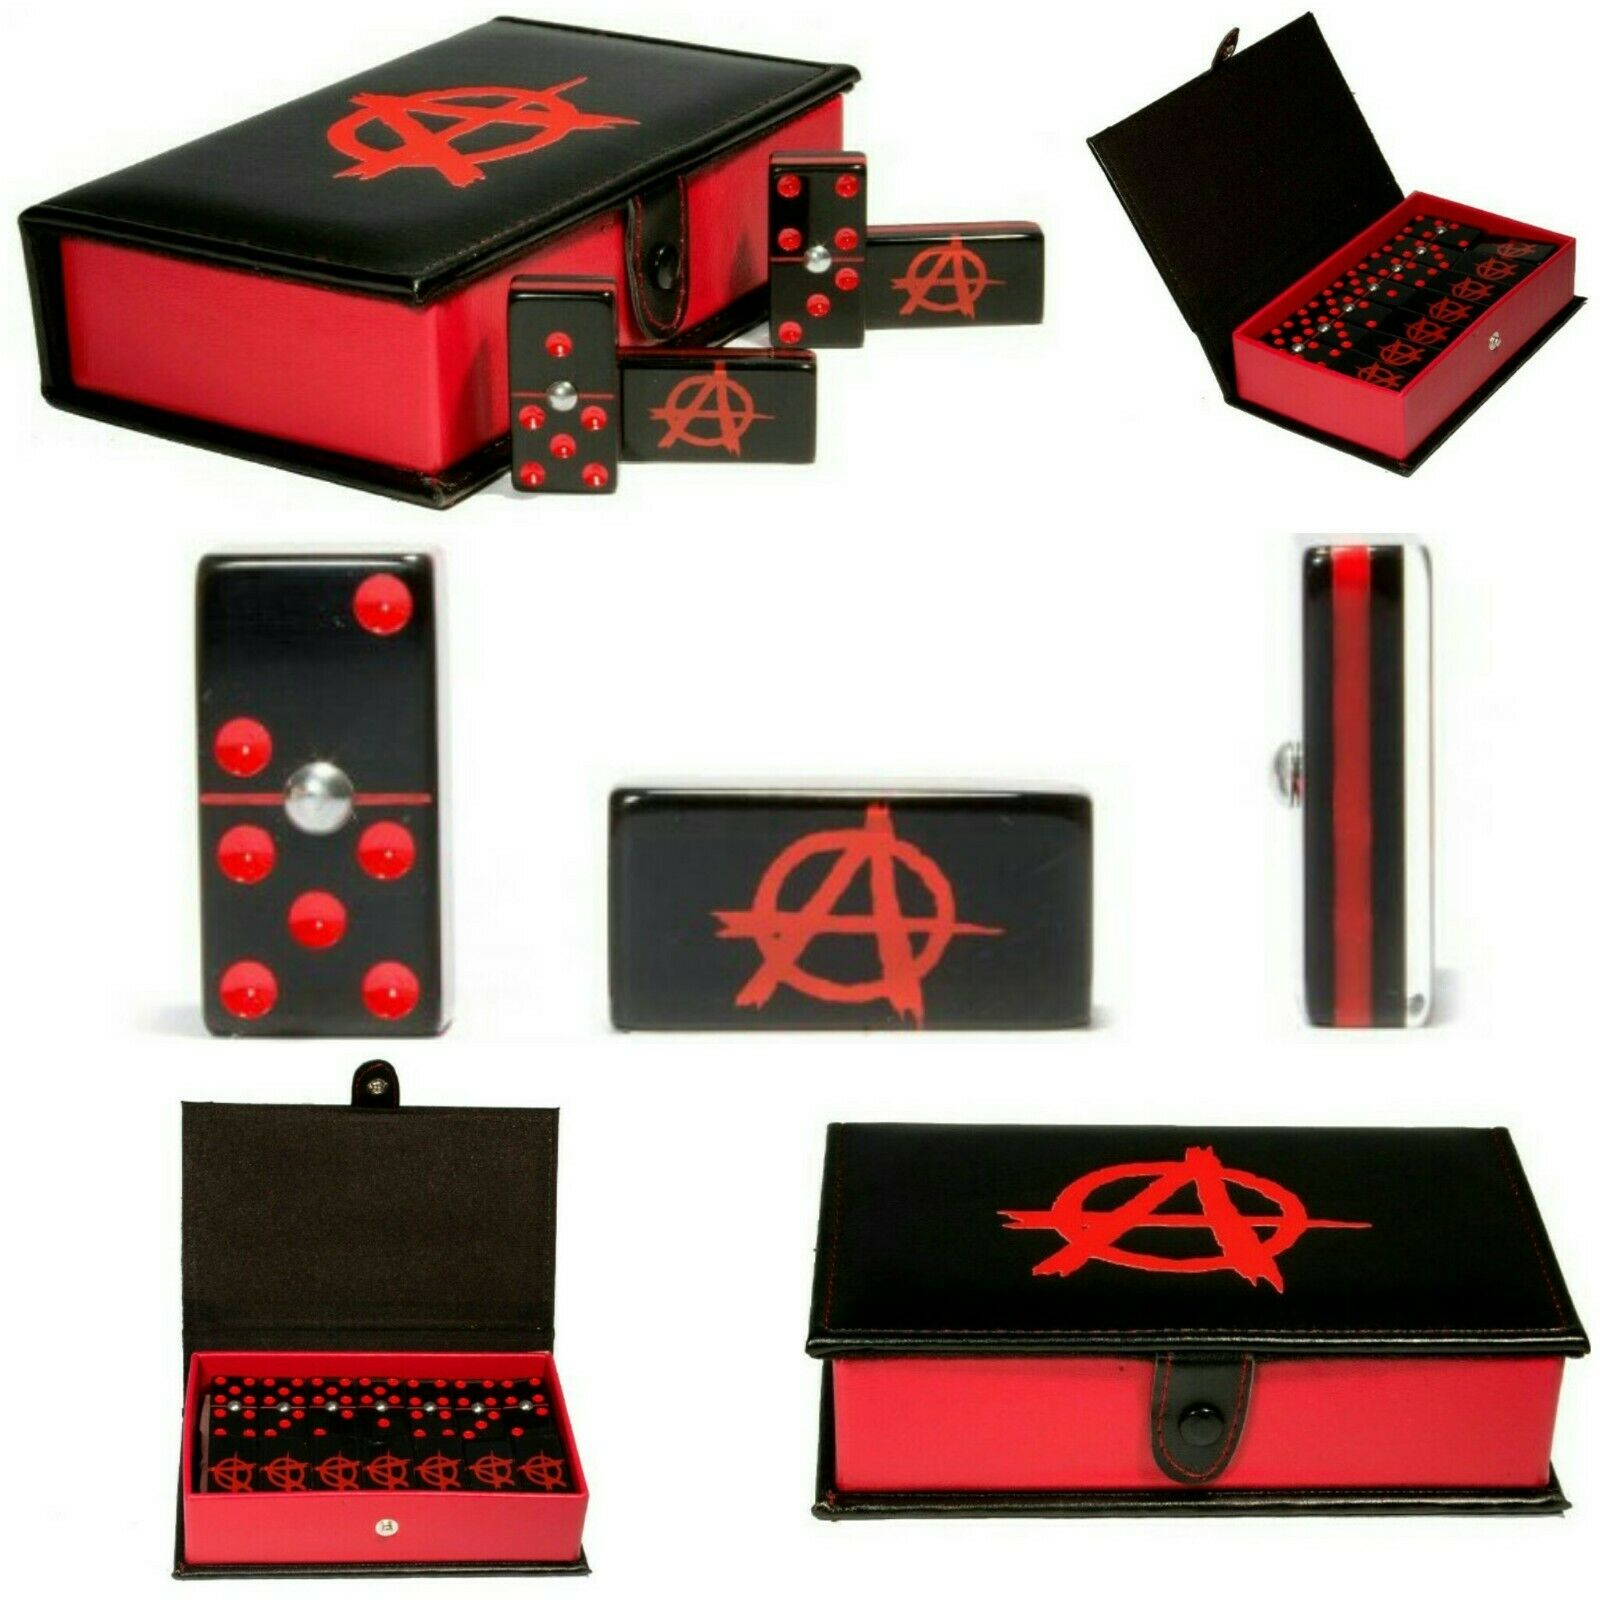 Anarchy Domino Game Set Double 6 Dominoes Man Men Hot Gift Man Cave SOA Samcro